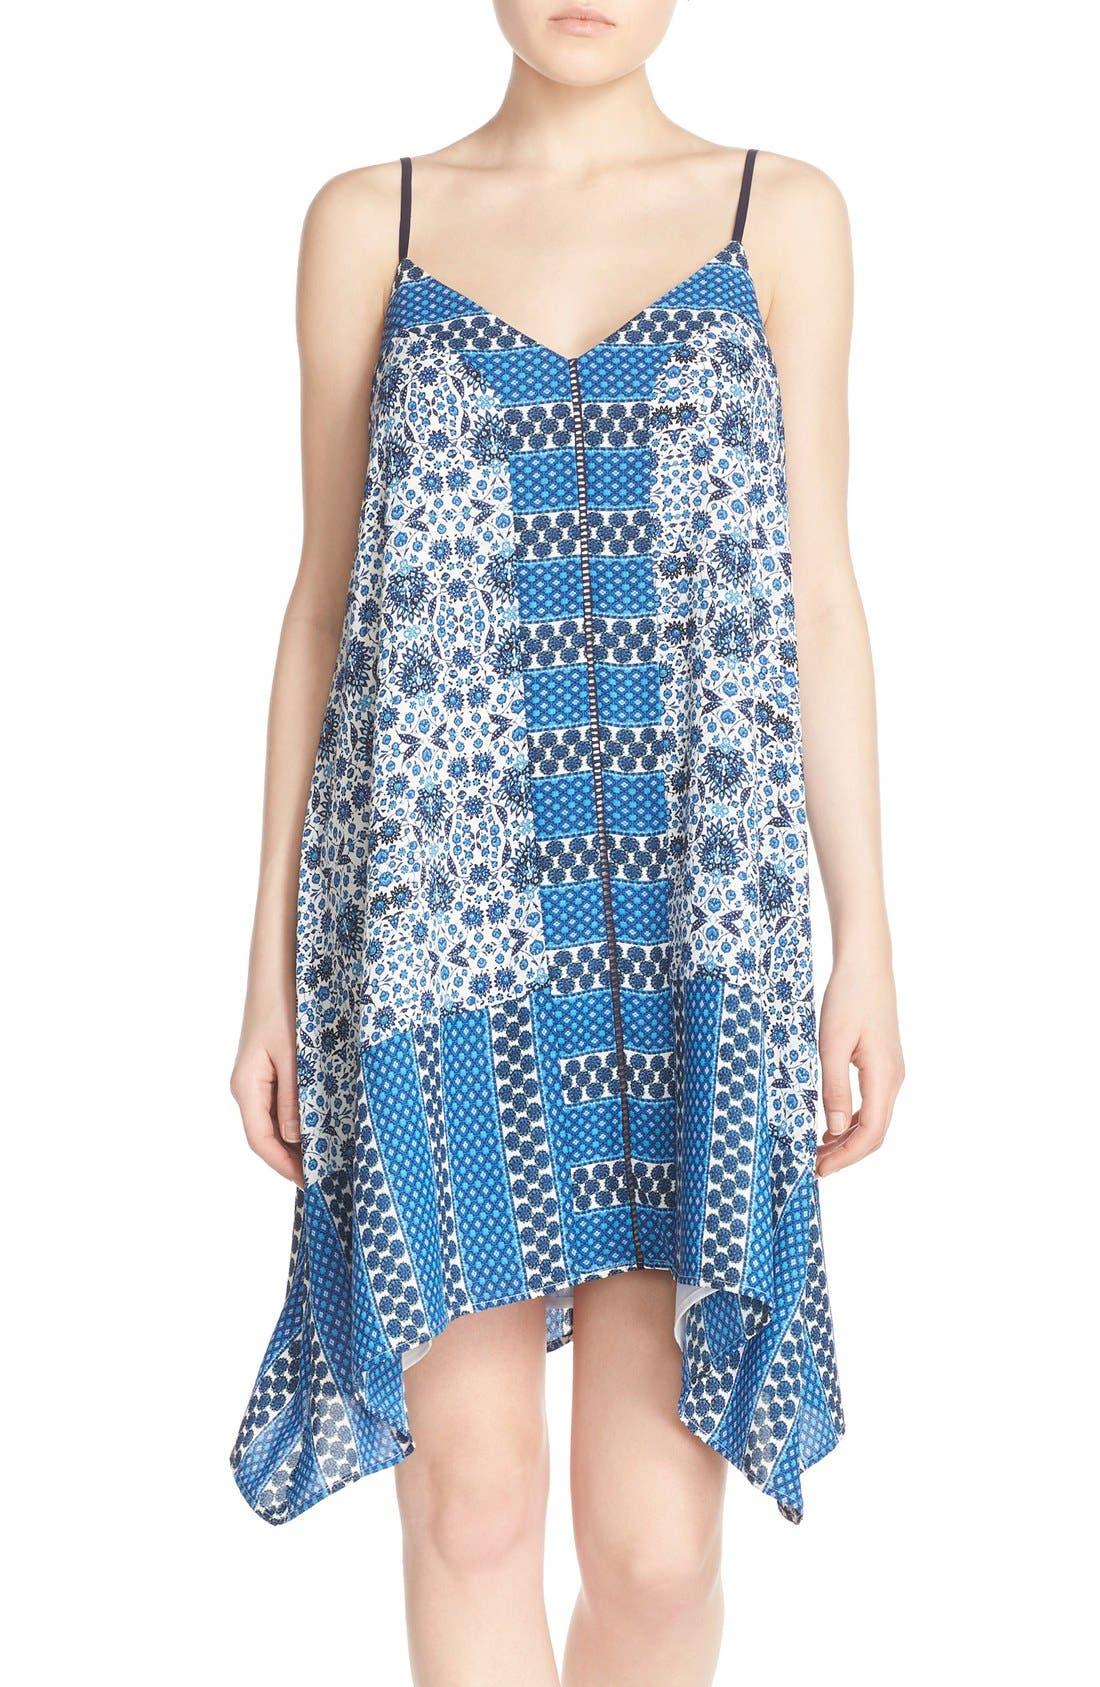 ADELYN RAE, Scarf Print Crepe Trapeze Dress, Main thumbnail 1, color, 400